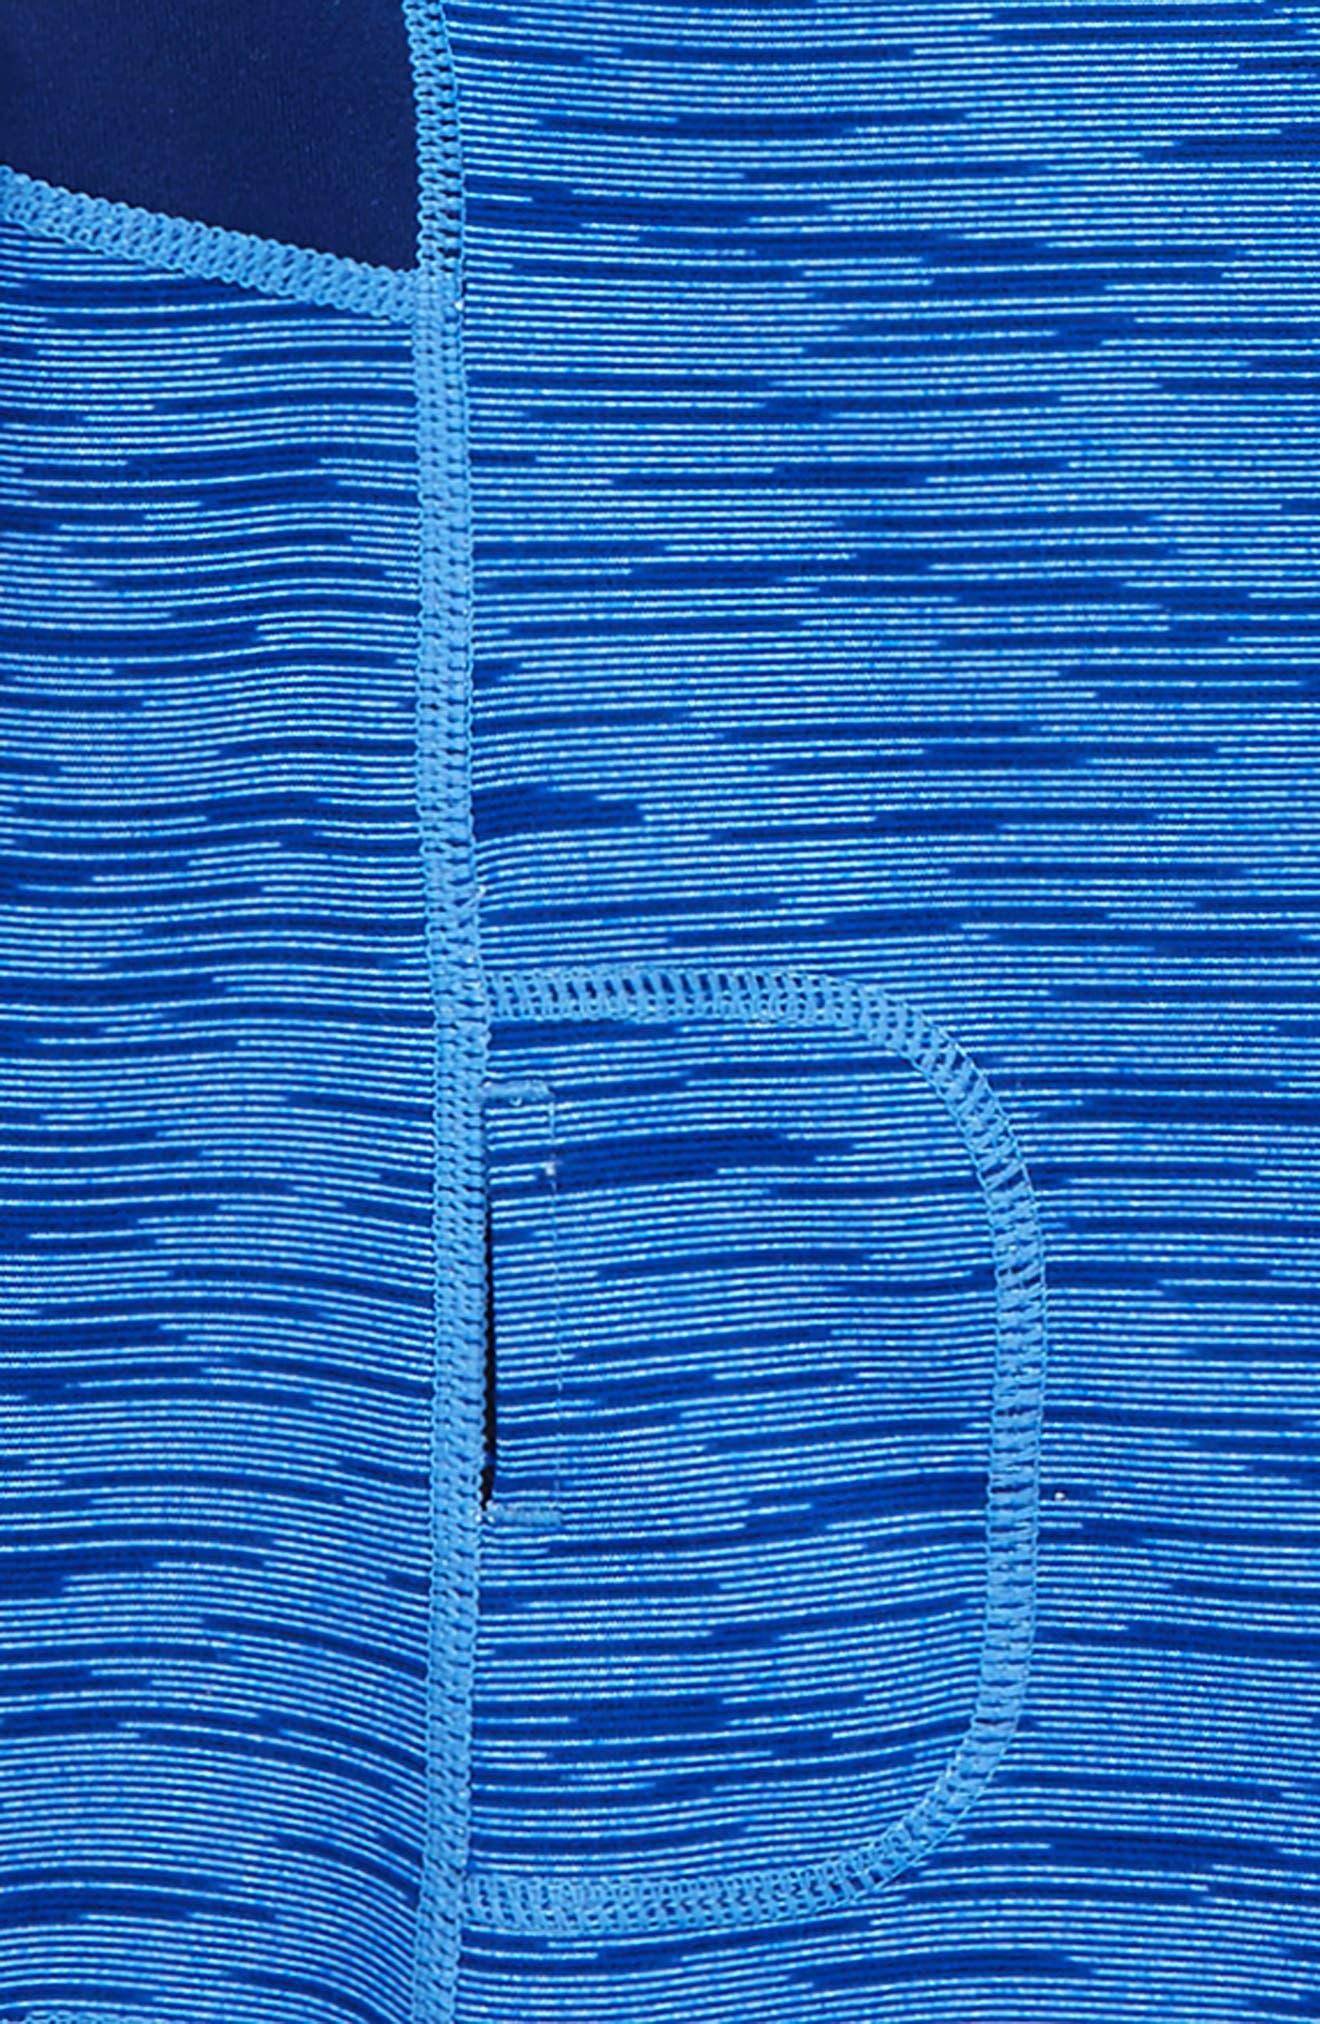 Base Camp Quarter Zip Pullover,                             Alternate thumbnail 2, color,                             Blue Vivid Sonic Spacedye